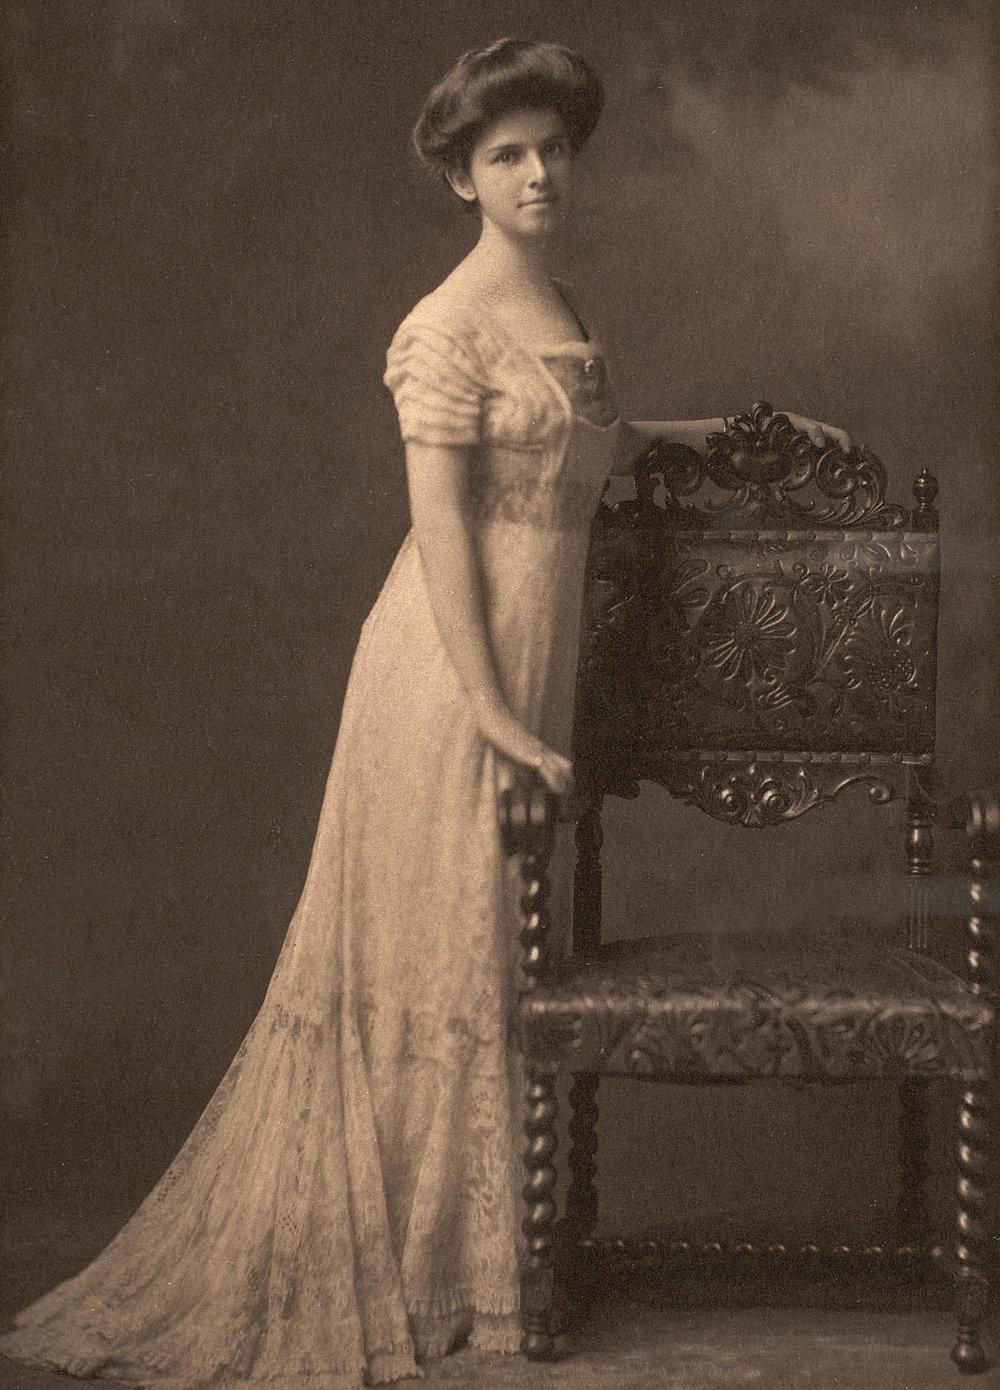 Alice LaForge Mead as a debutante, 1899